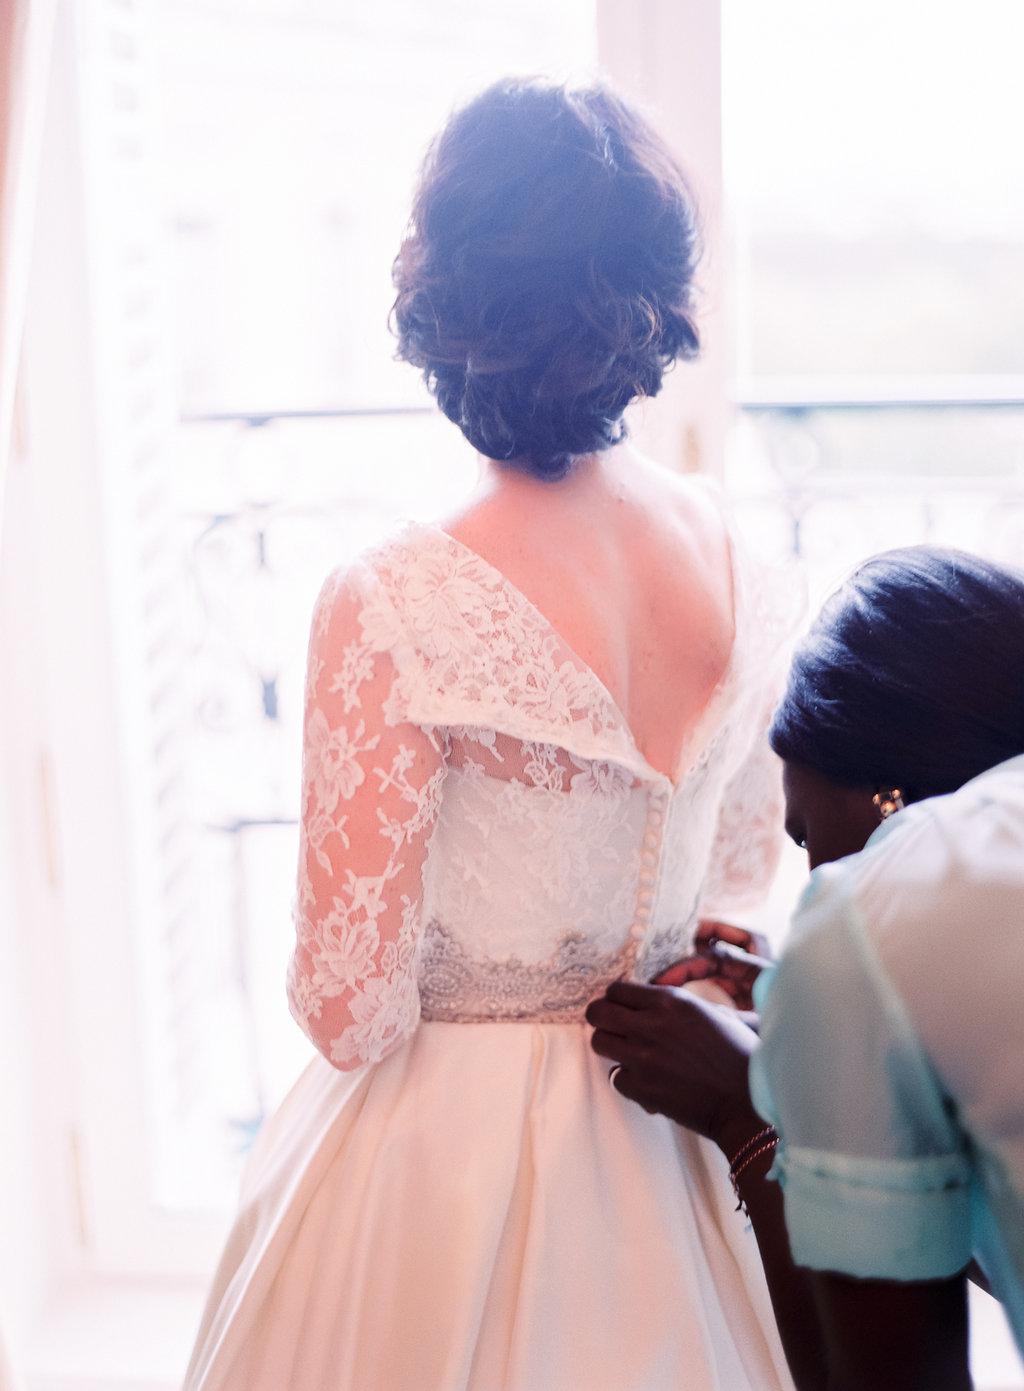 Yanique in paris wedding planner